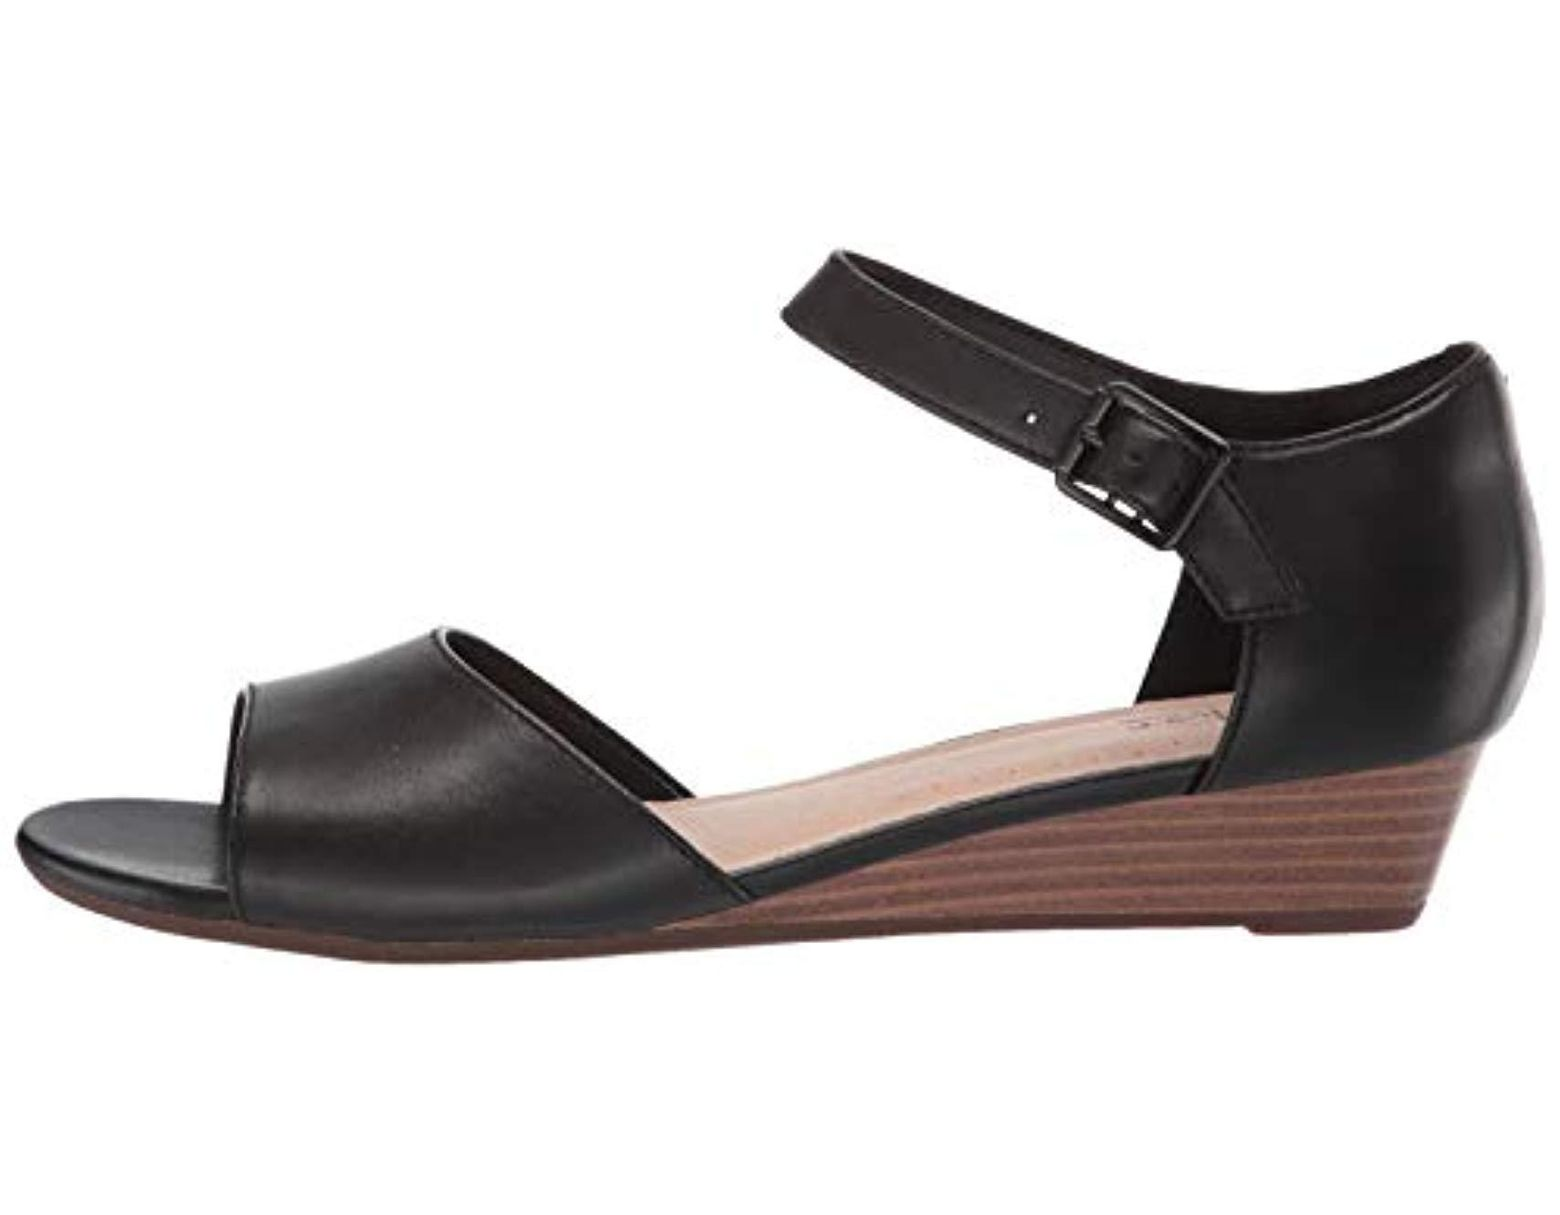 8832f1ba65 Clarks Abigail Jane Wedge Sandal in Black - Save 29% - Lyst